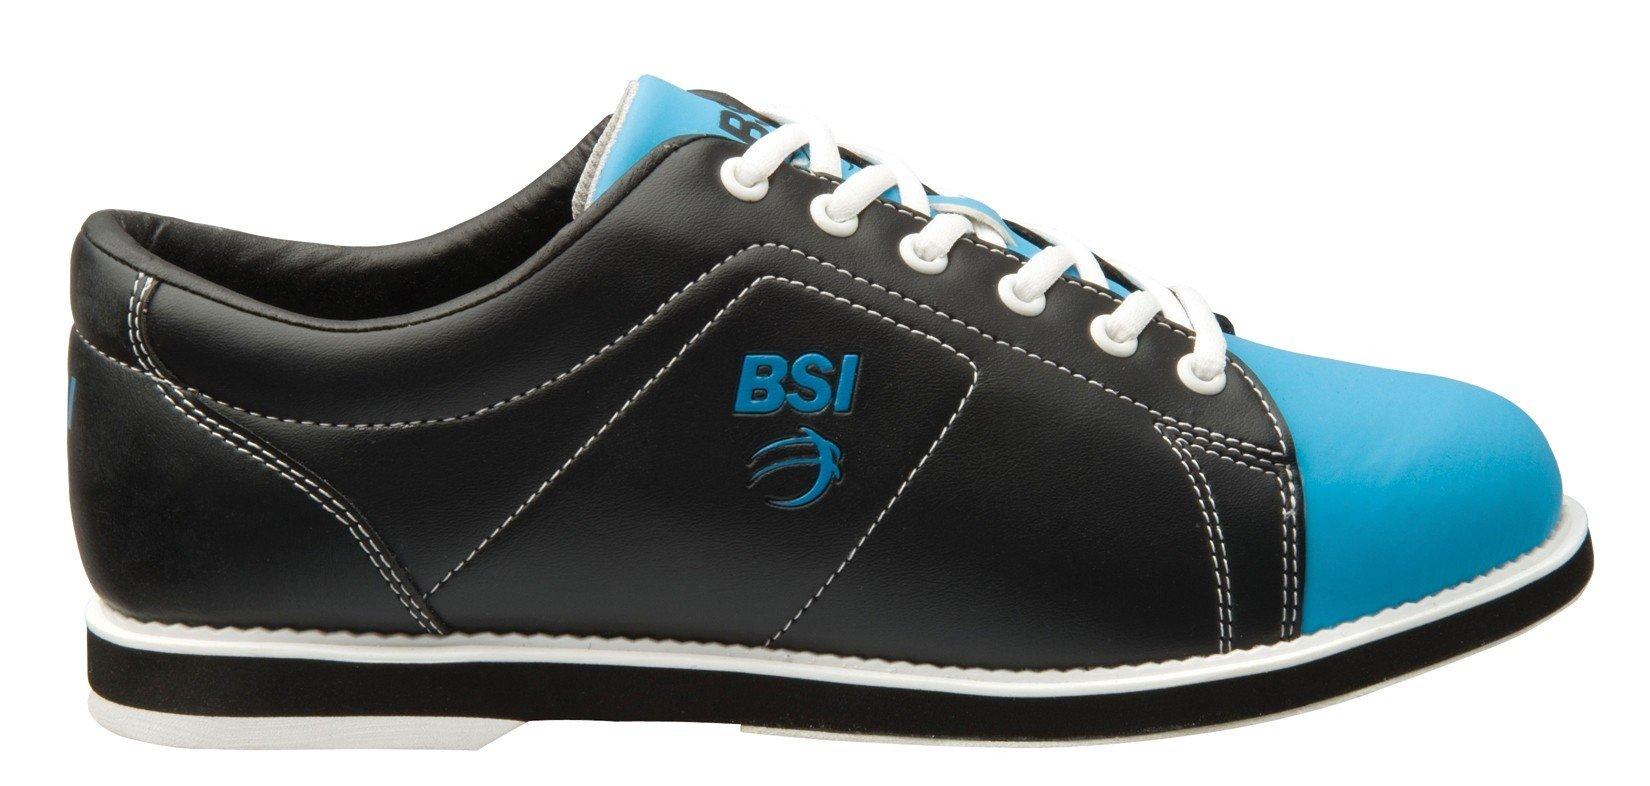 BSI Women's Classic  Bowling Shoe, Black/Blue, 8.5 by BSI